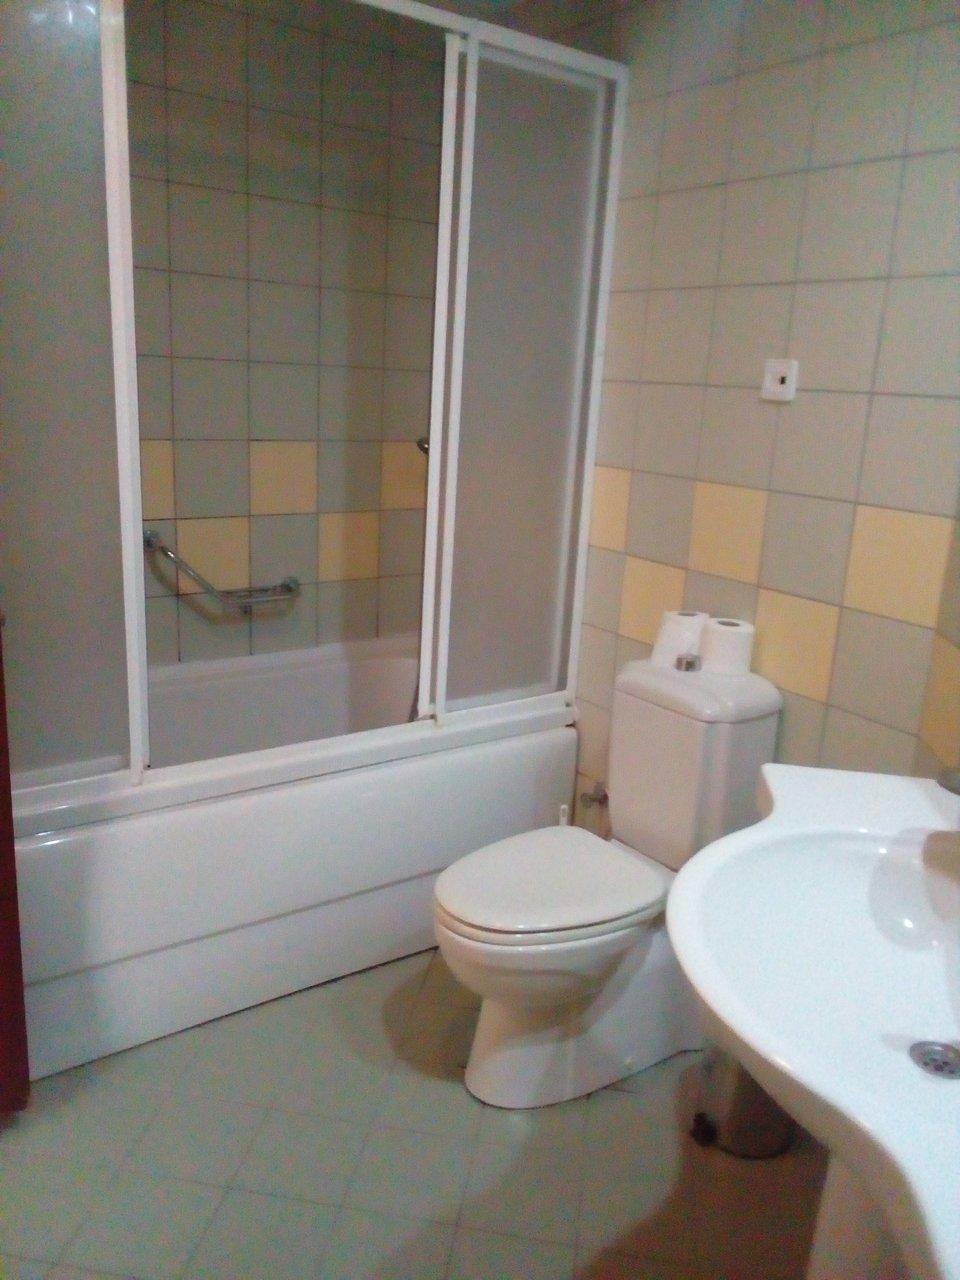 Hotel Banana 4 (Turkey, Alanya): photos, room description, service, tips and tourist reviews 72